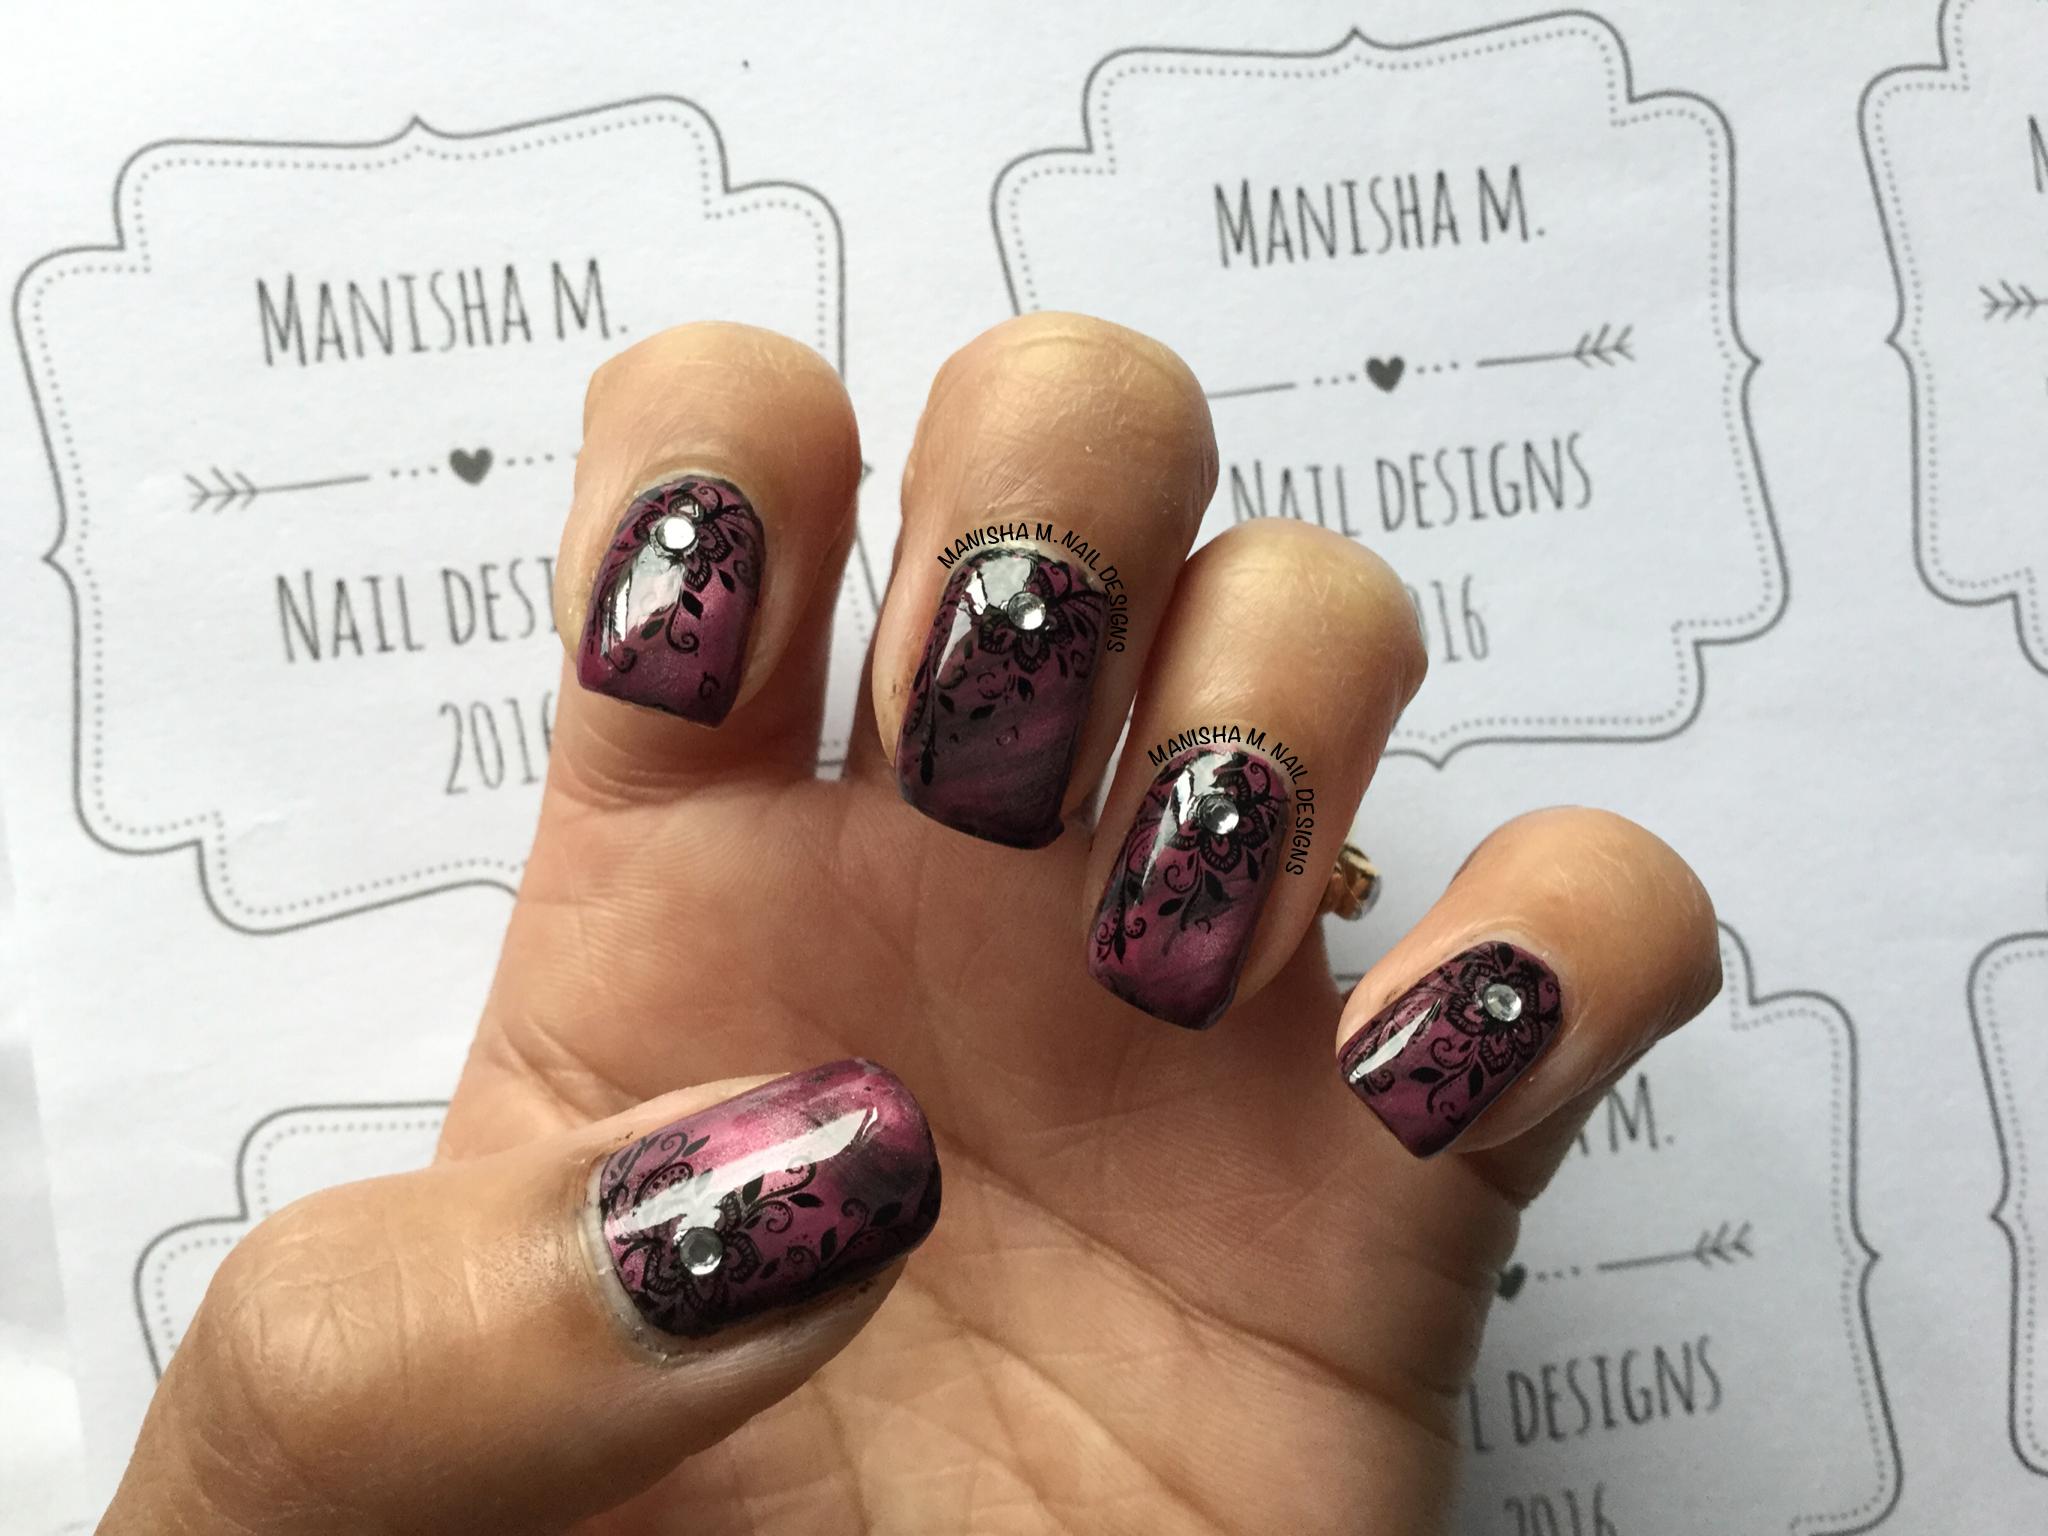 BM-XL206   Manisha M. Nail Designs - Nail Art by Me ❤   Pinterest ...